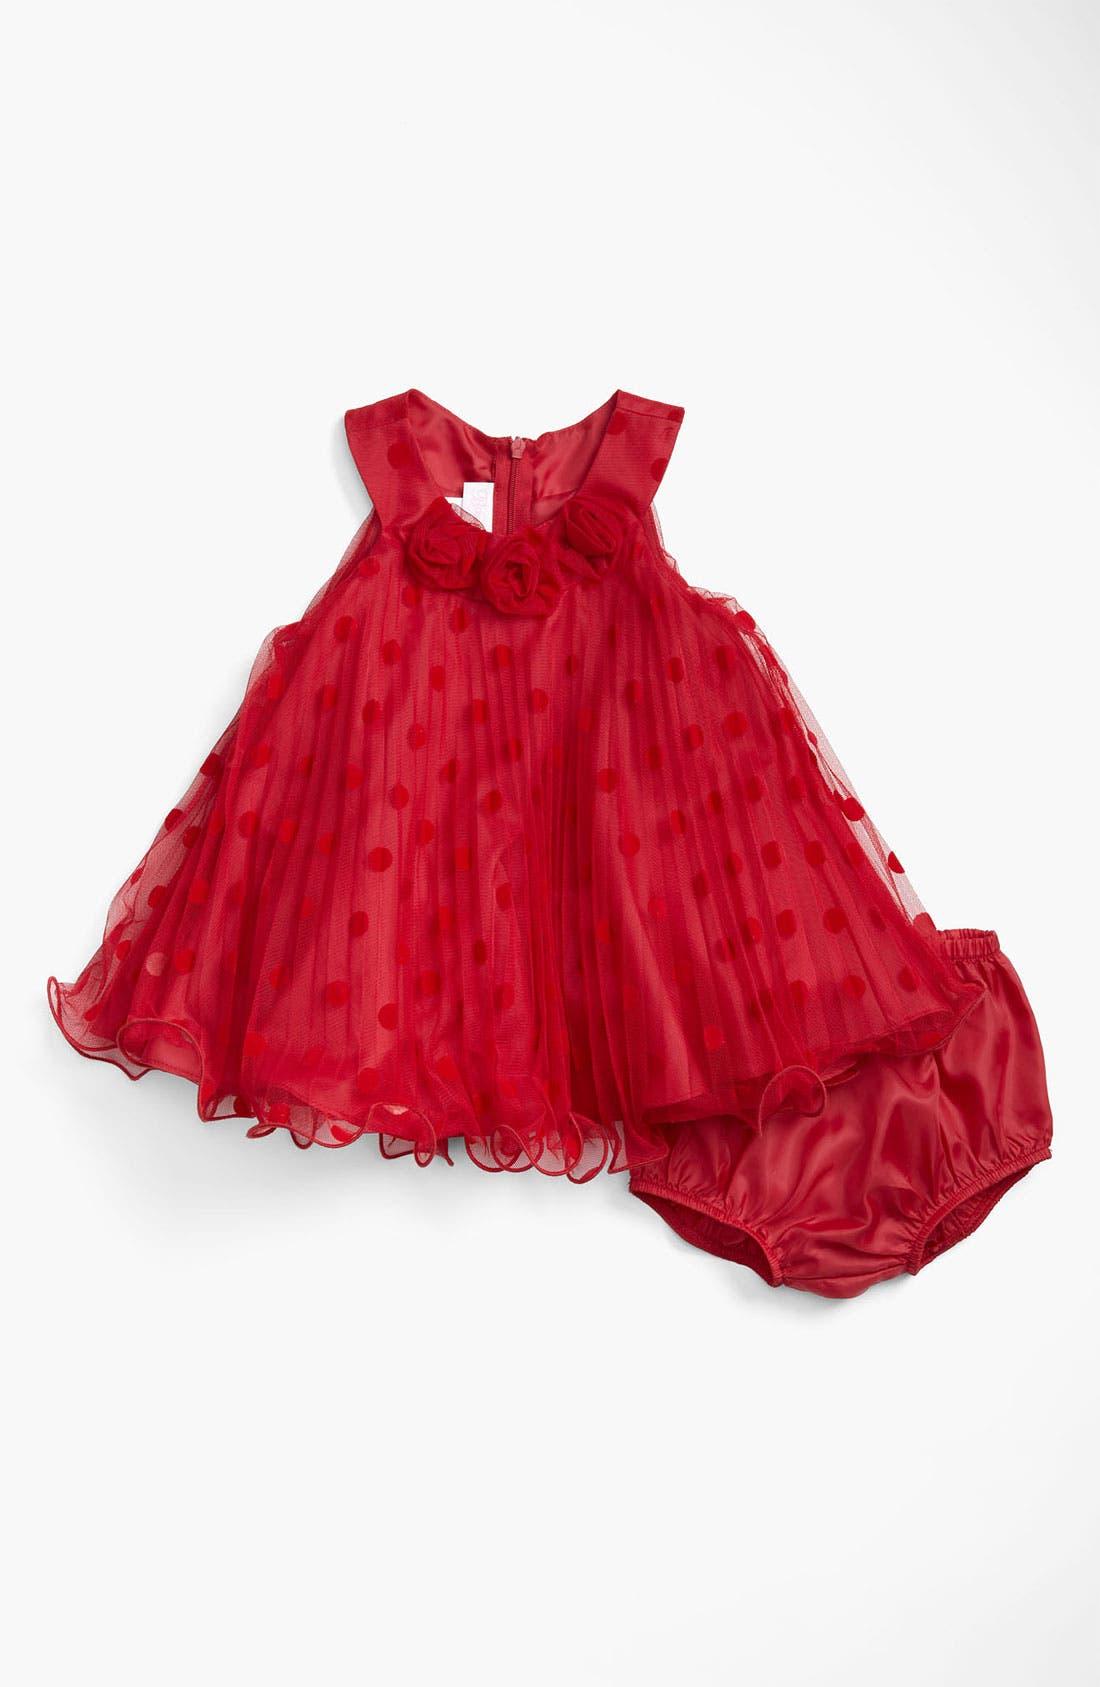 Alternate Image 1 Selected - Gerson & Gerson Polka Dot Mesh Dress (Infant)